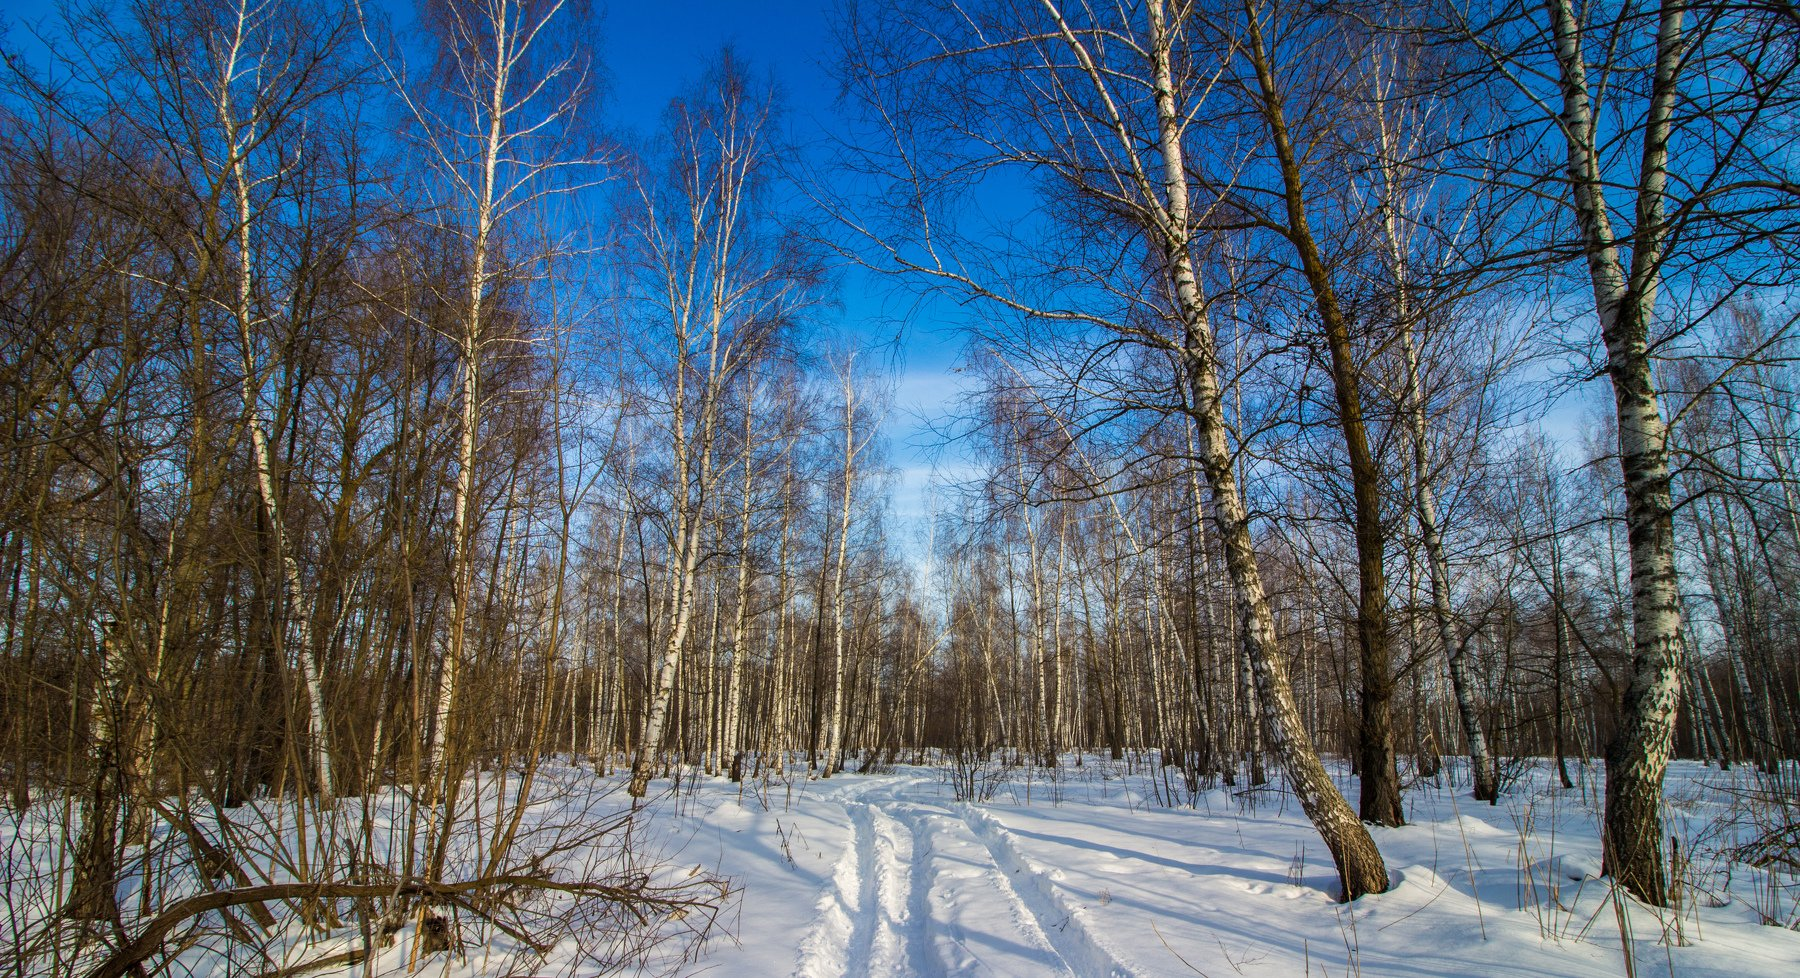 лес, зима, снег, берёзы, дорога, Руслан Востриков